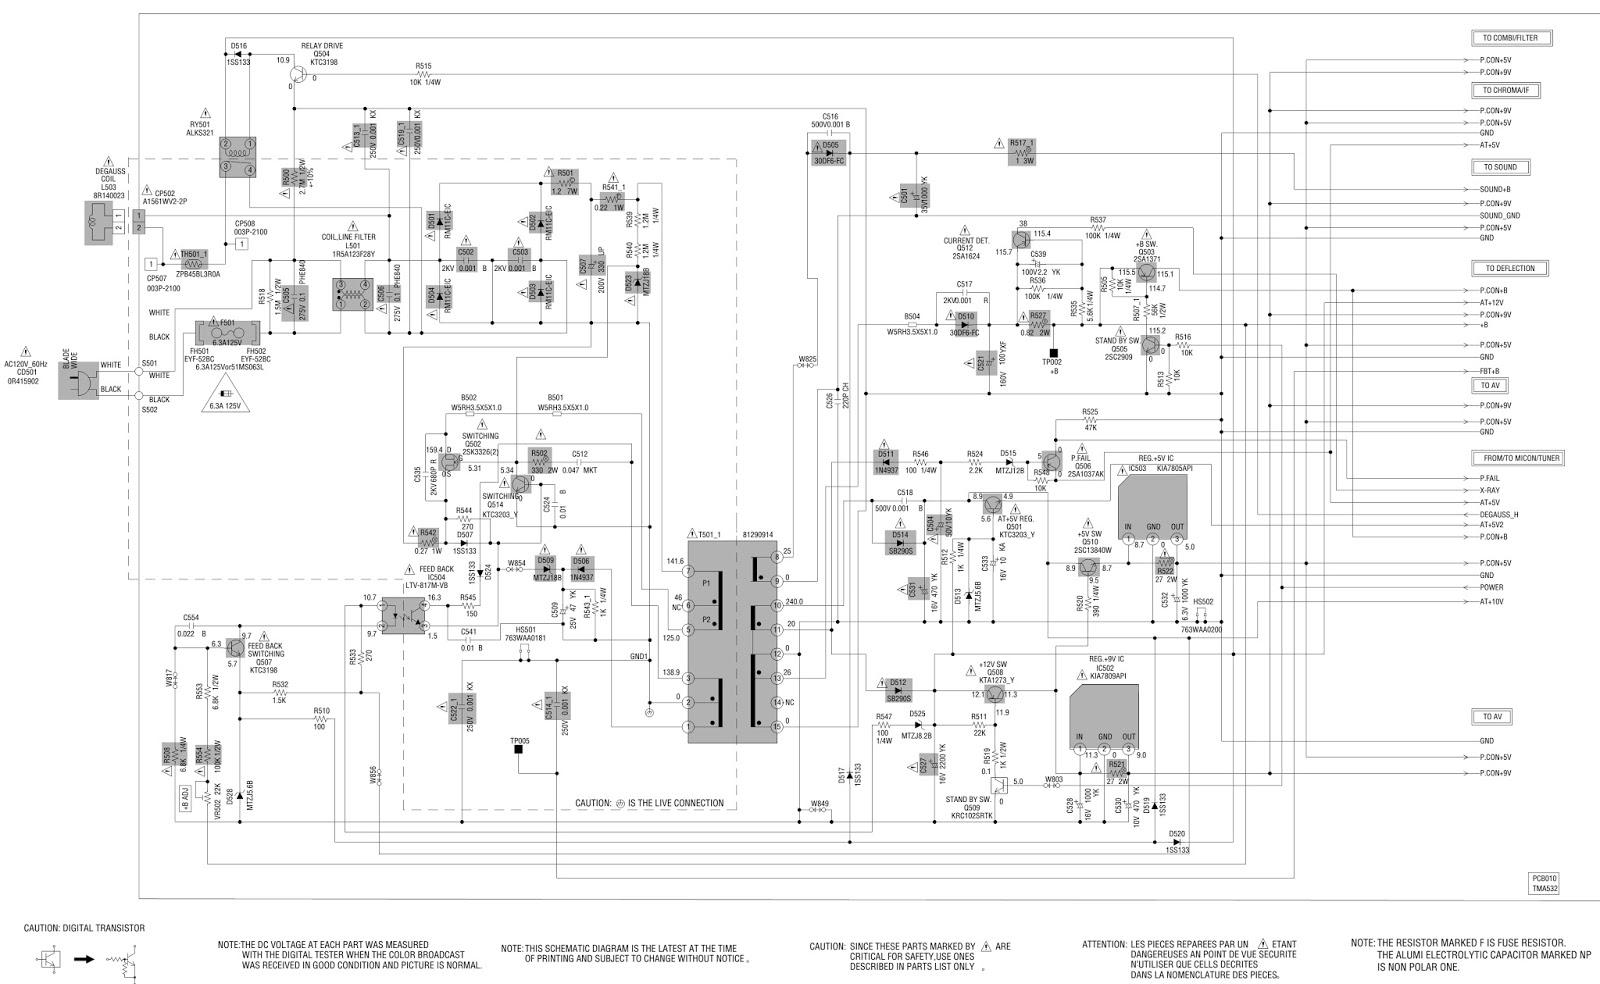 jvc av14f703 crt tv schematic using 2sk3326 ltv 817m rh schematicscom blogspot com free schematic diagram jvc tv schematic diagram tv jvc